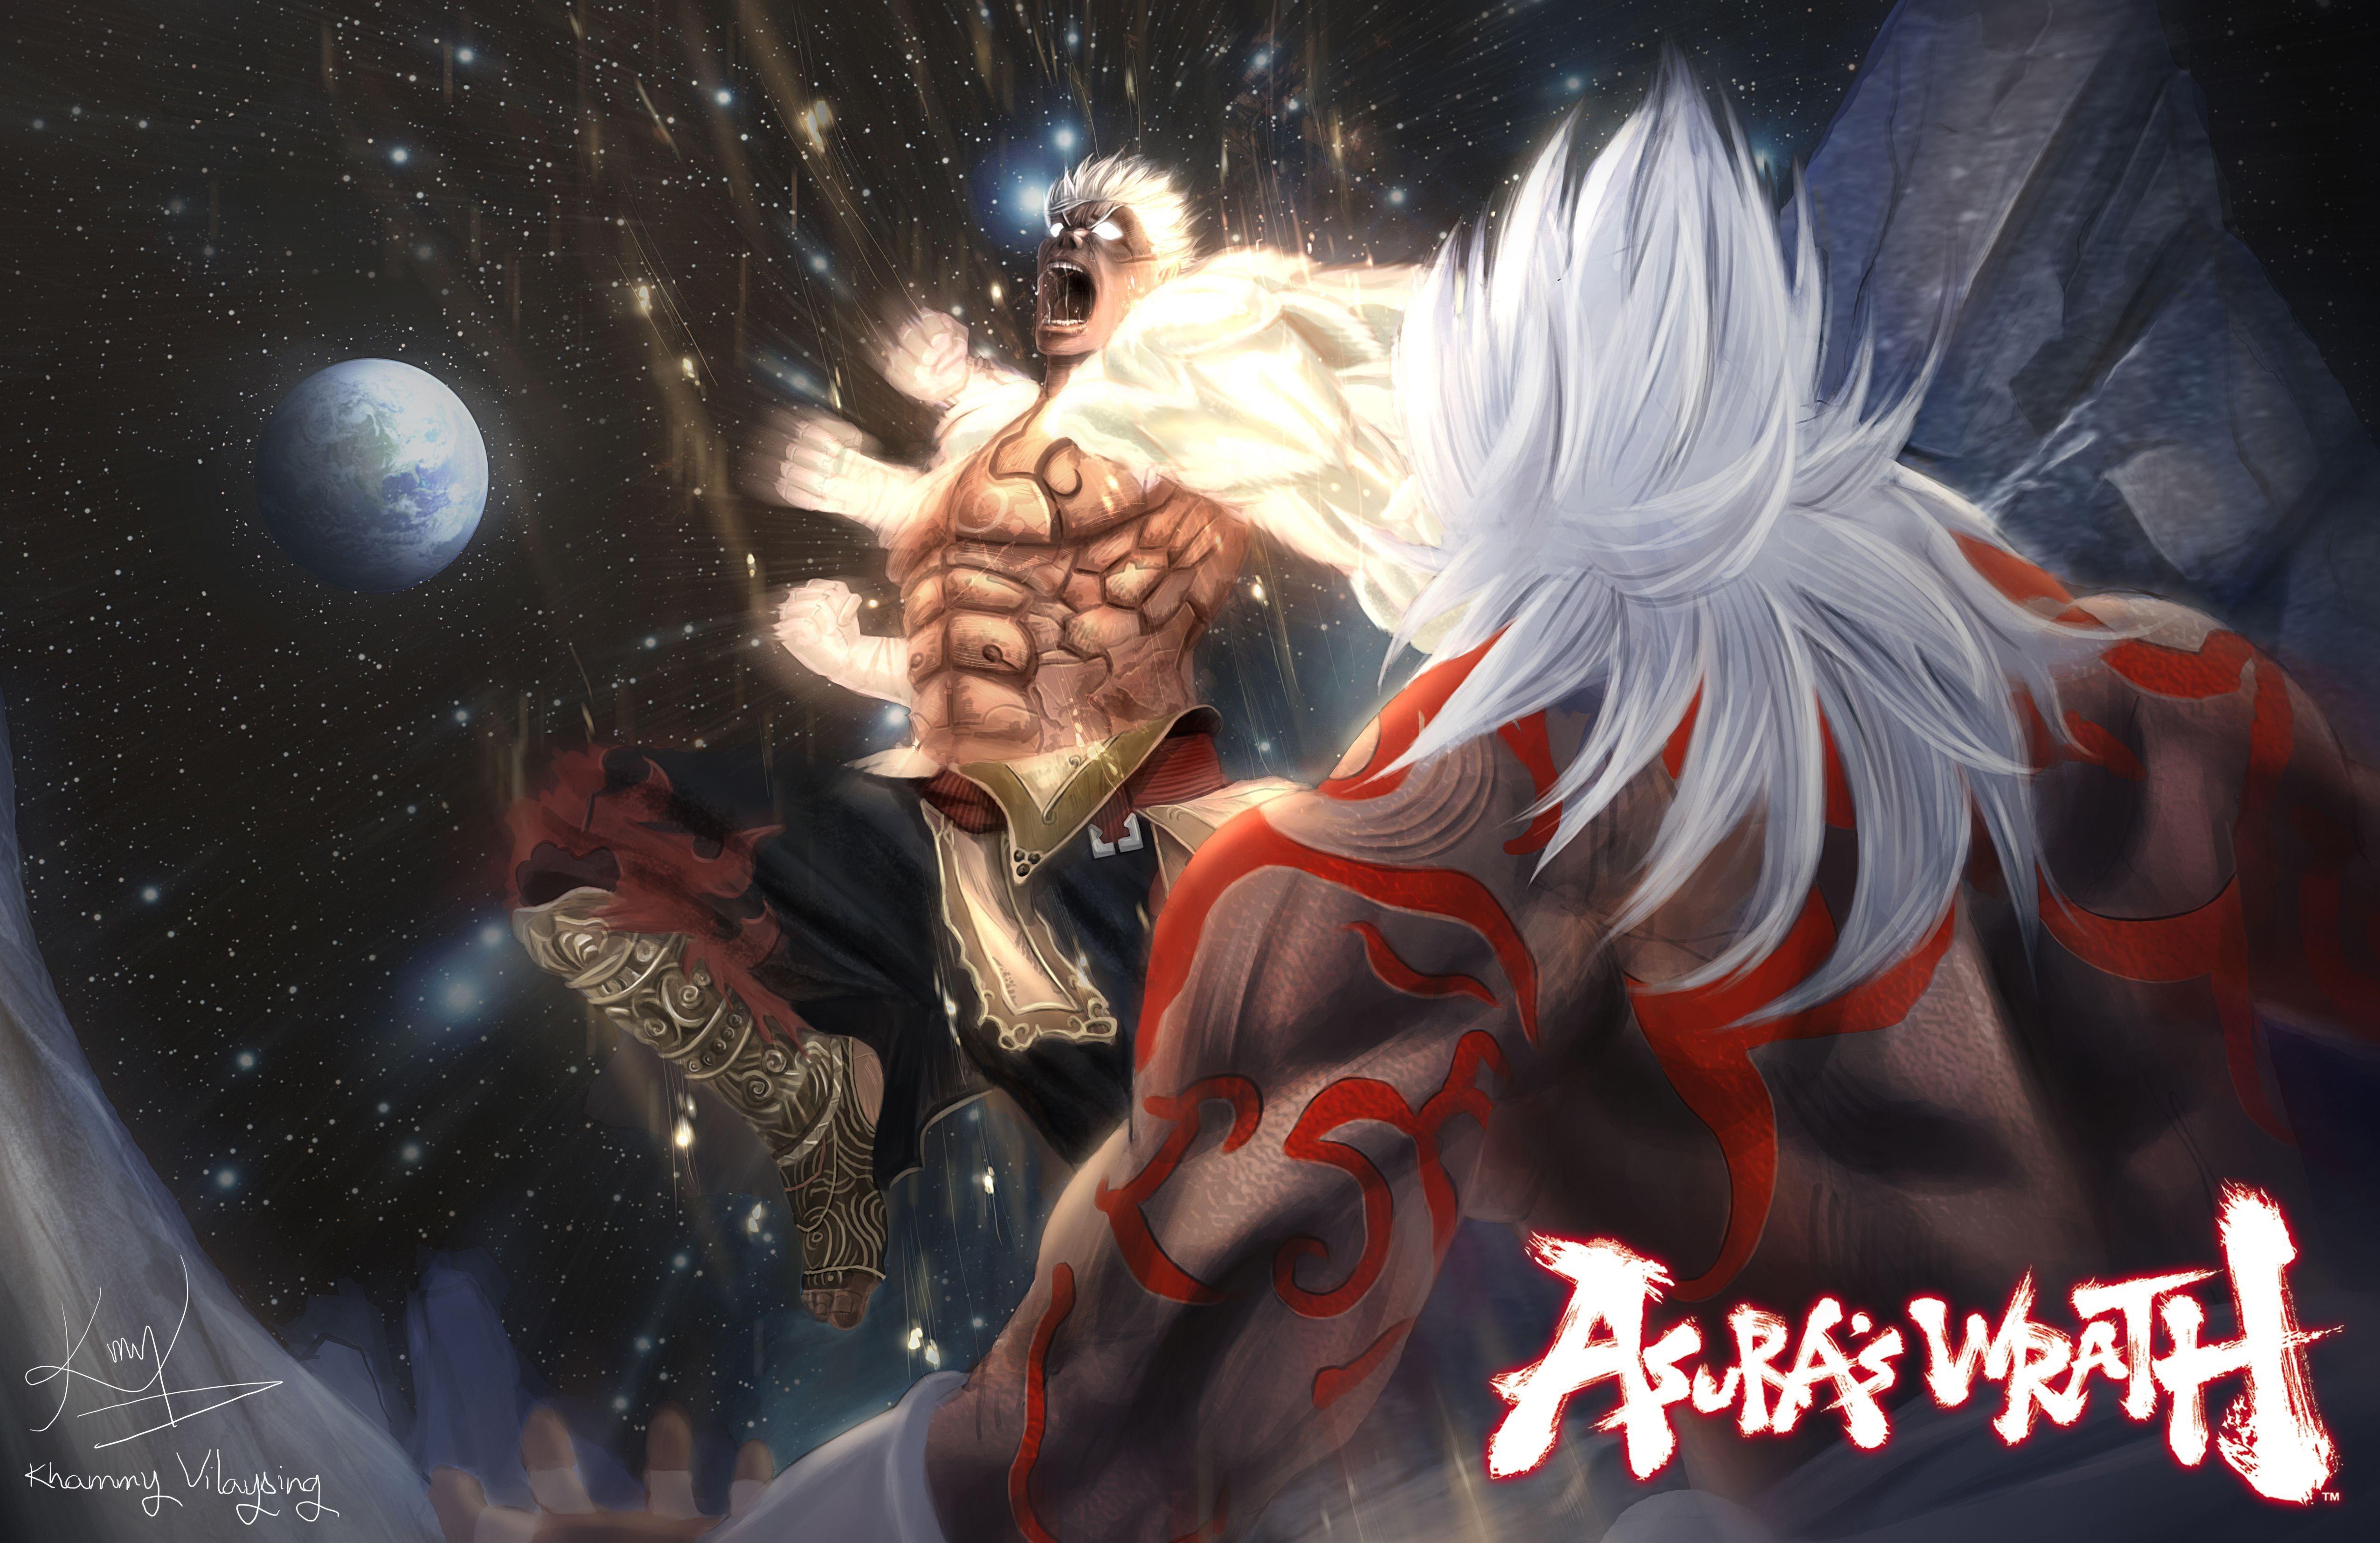 Asuras Wrath Hd Desktop Wallpaper High Definition Fullscreen Asura S Wrath Wrath Werewolf Art